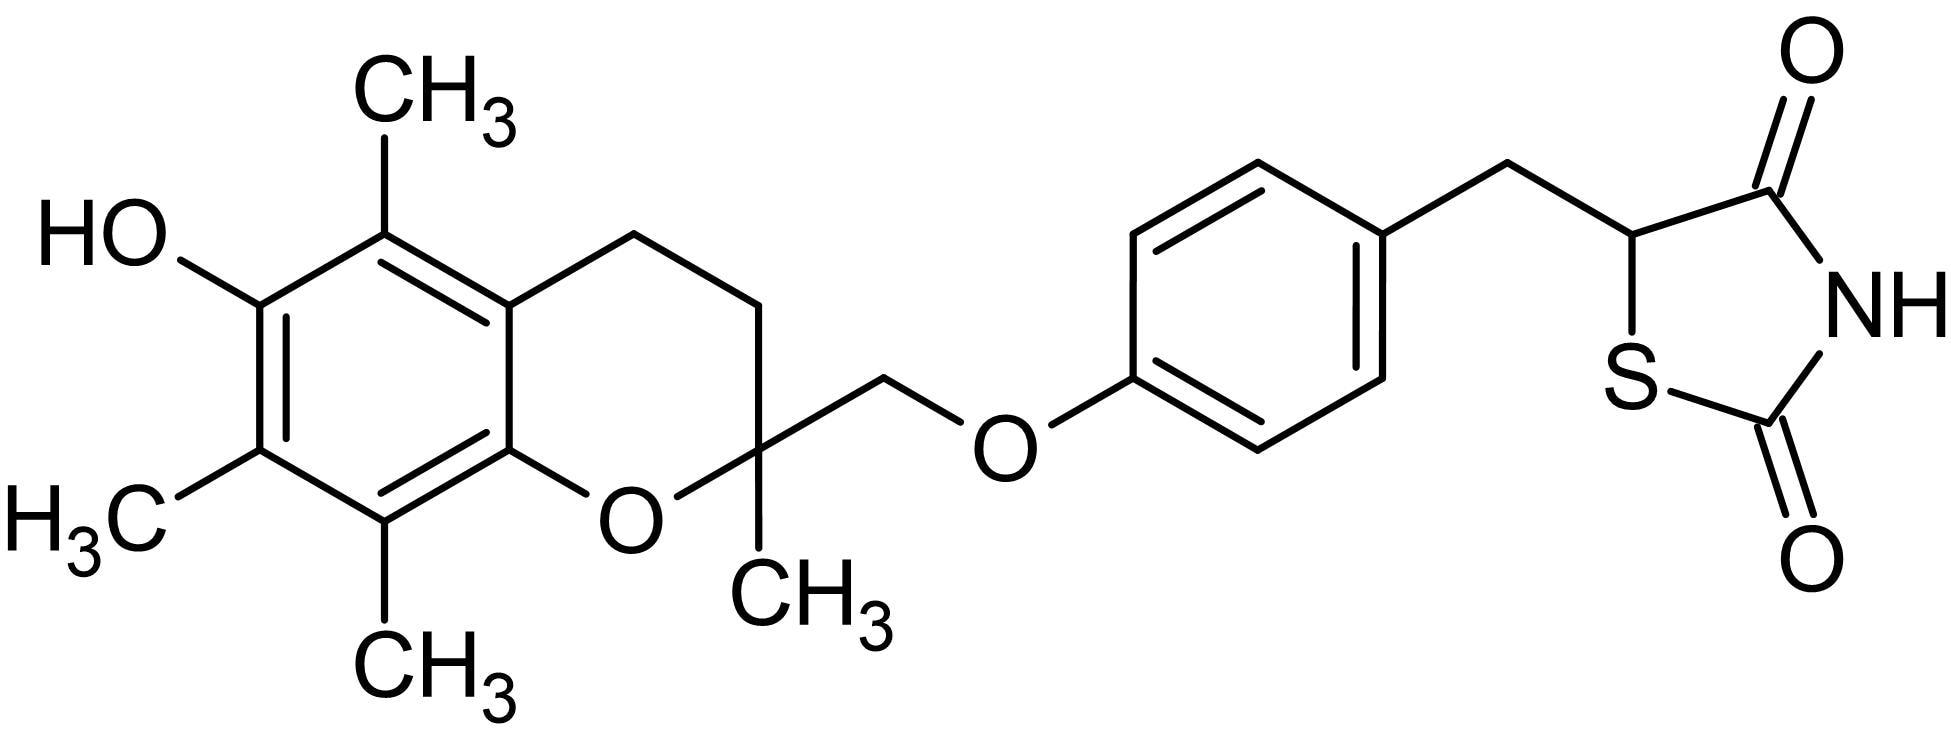 Chemical Structure - Troglitazone, PPAR-gamma receptor agonist (ab141112)